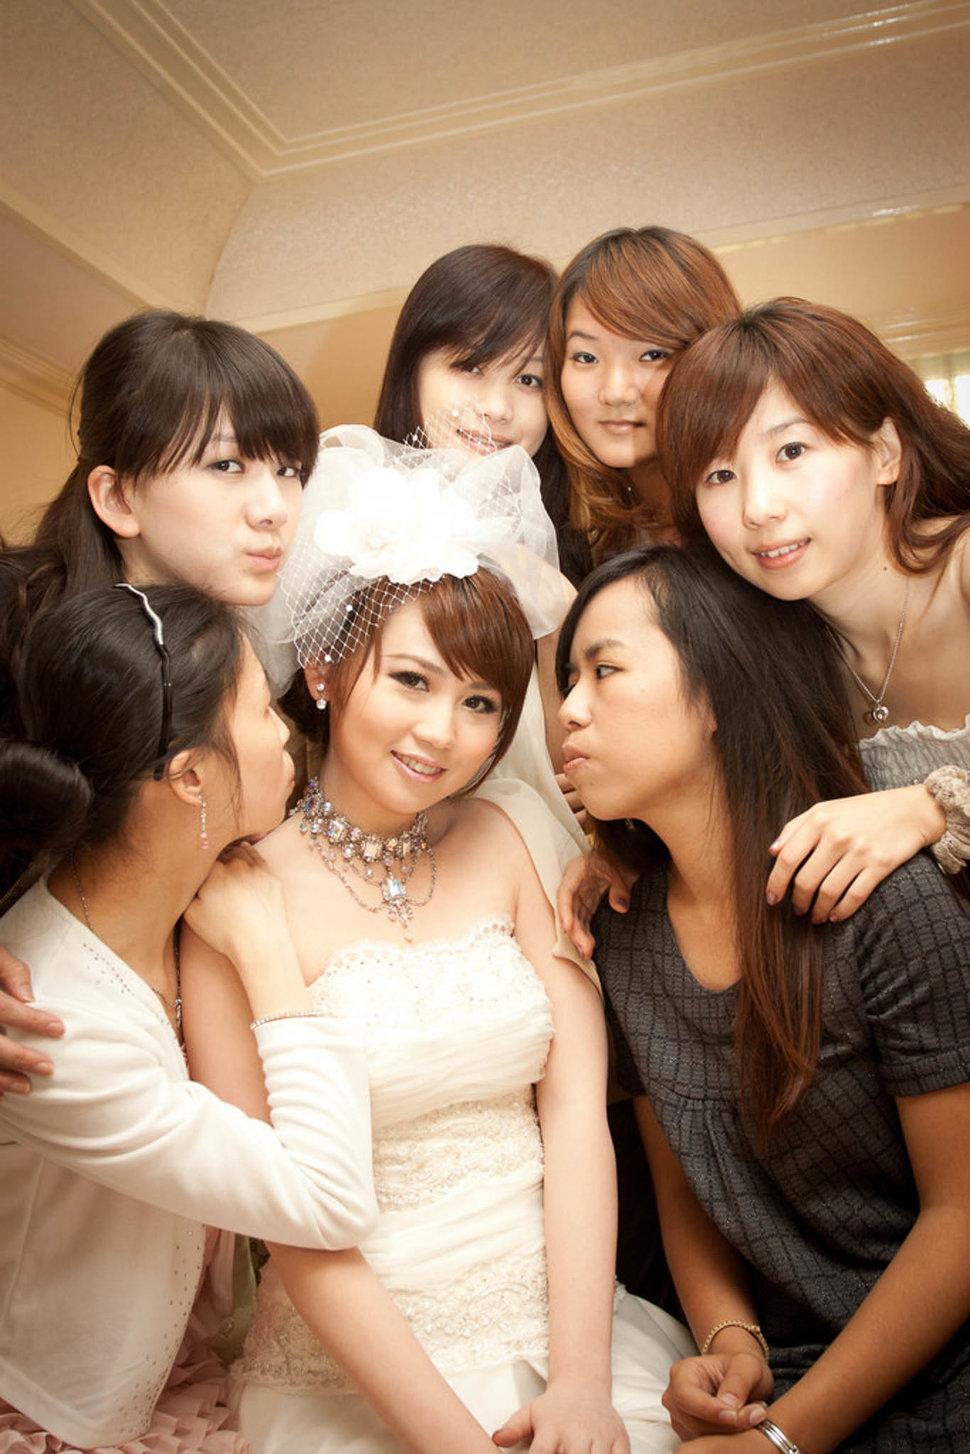 18PHOTO-佳成❤️ 玨萍(編號:220175) - 18PHOTO 婚紗影像攝影工作室 - 結婚吧一站式婚禮服務平台